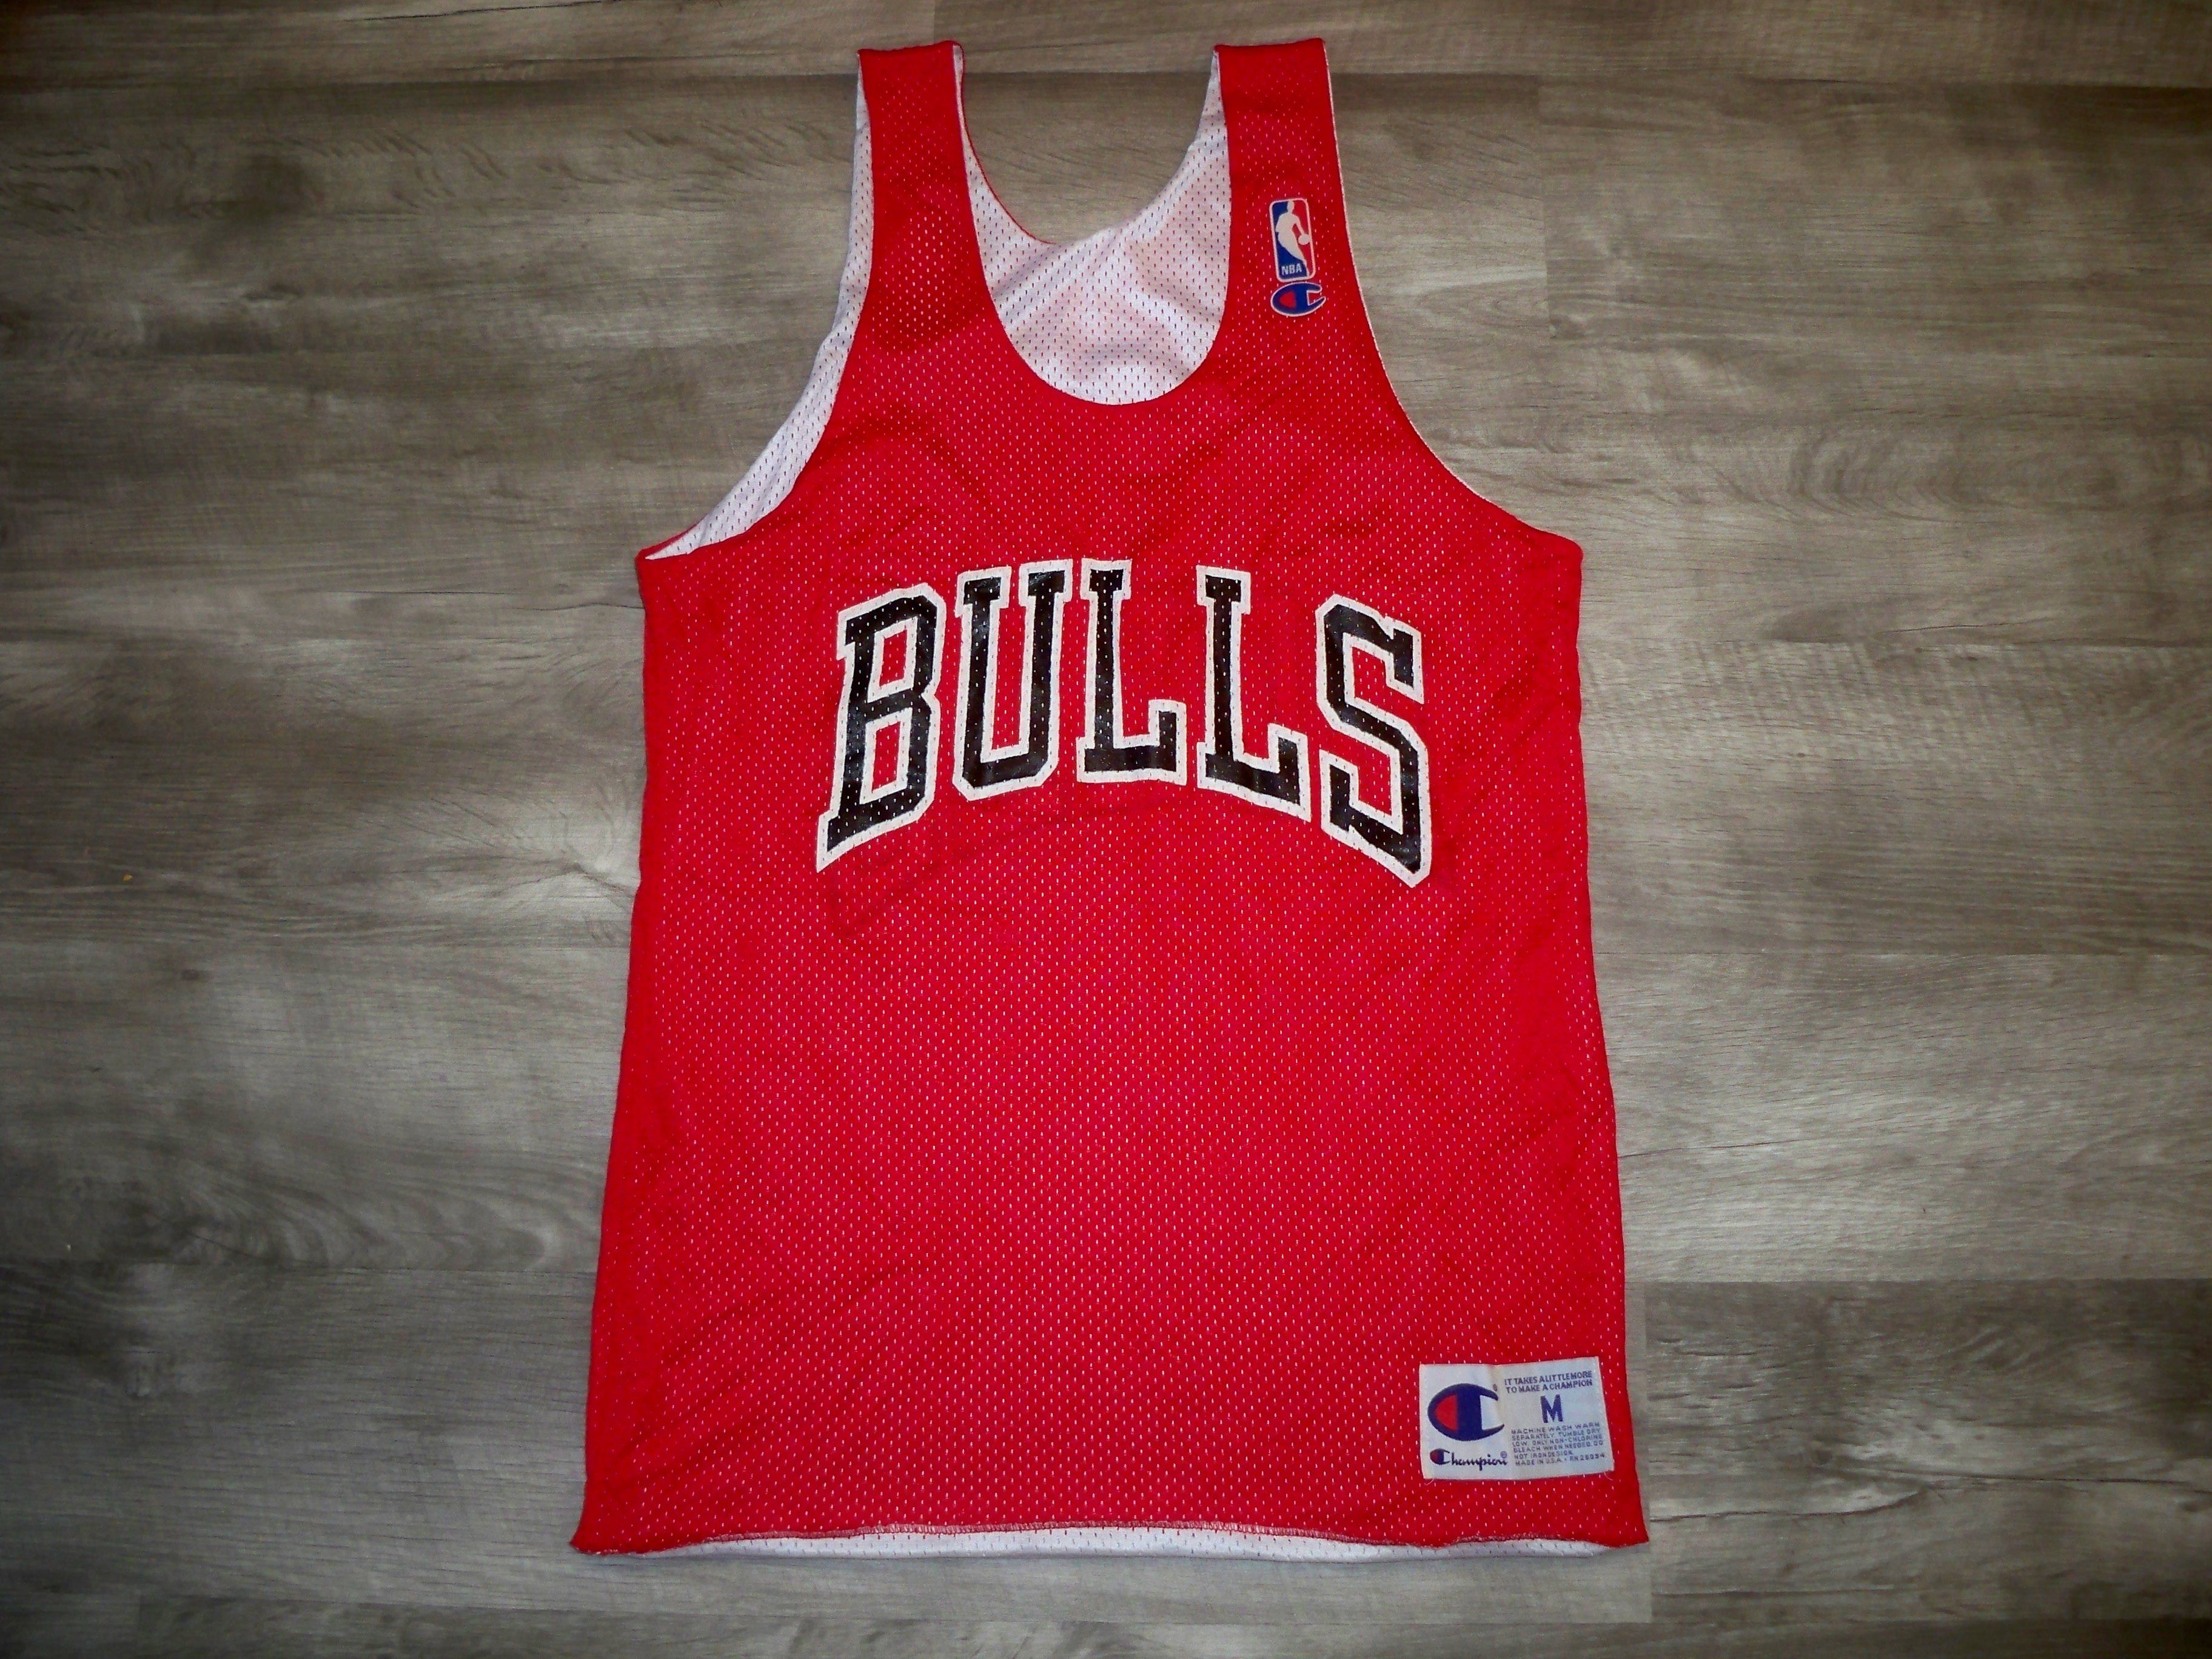 74e4db72065 Vintage Champion Chicago Bulls Reversible Jordan Era NBA Basketball Jersey  Uniform Size Medium Made in USA